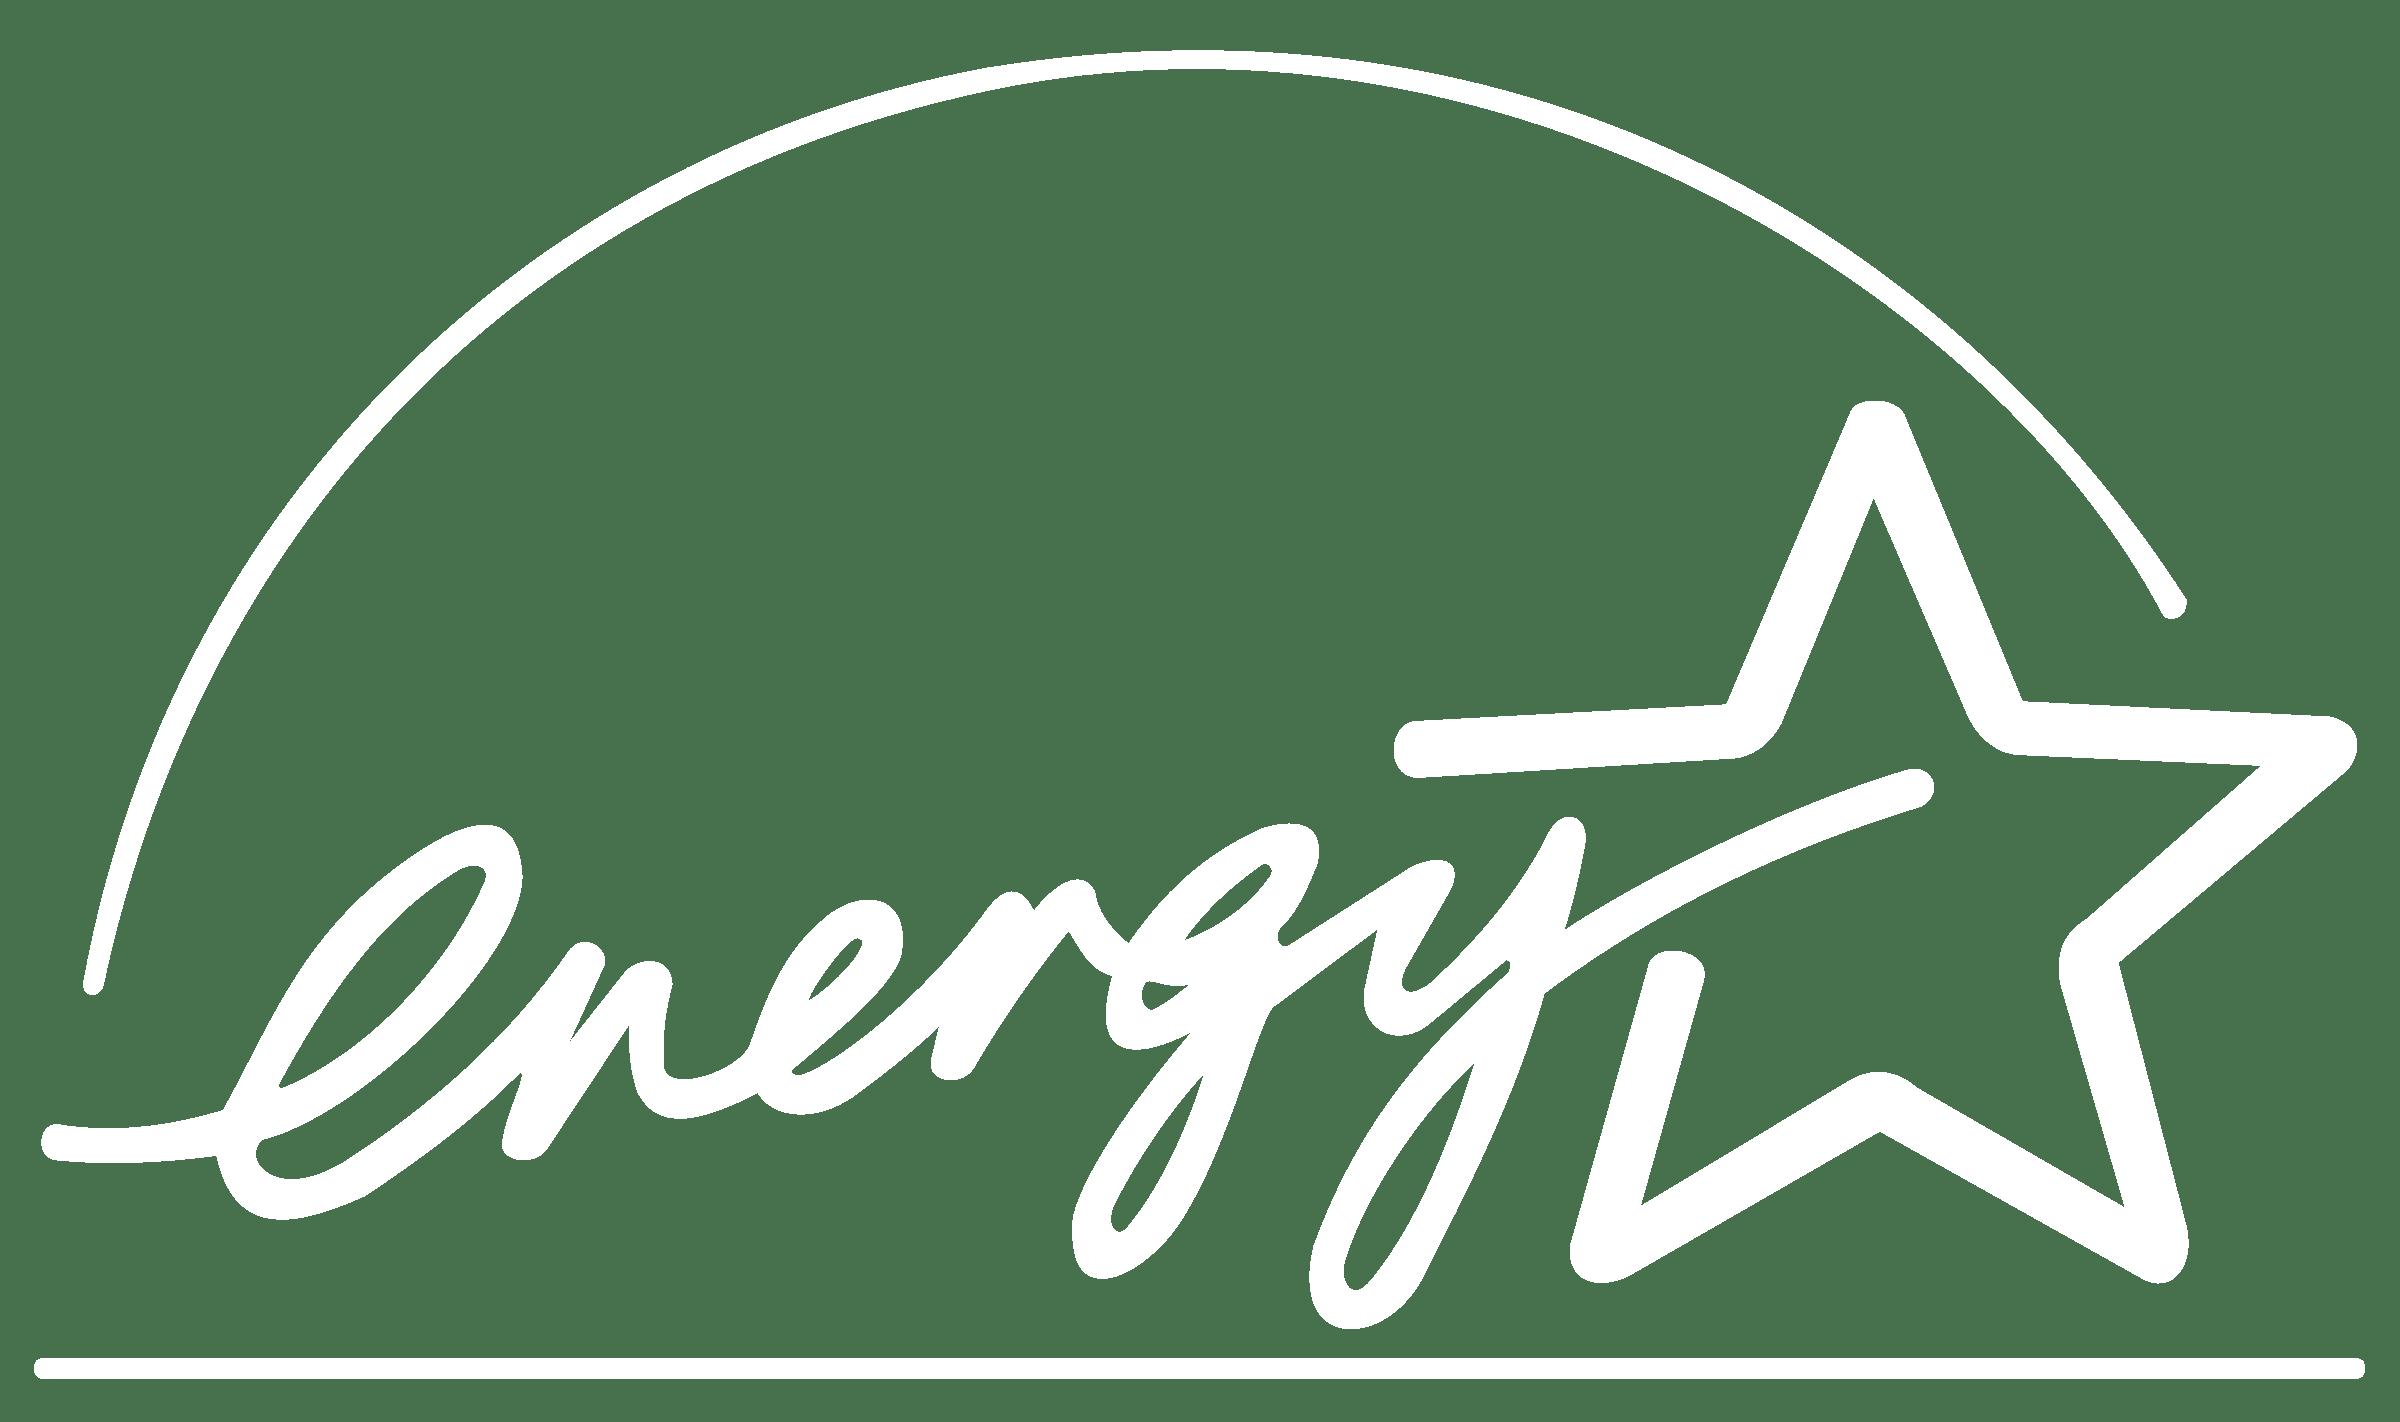 energy star 3 logo png transparent